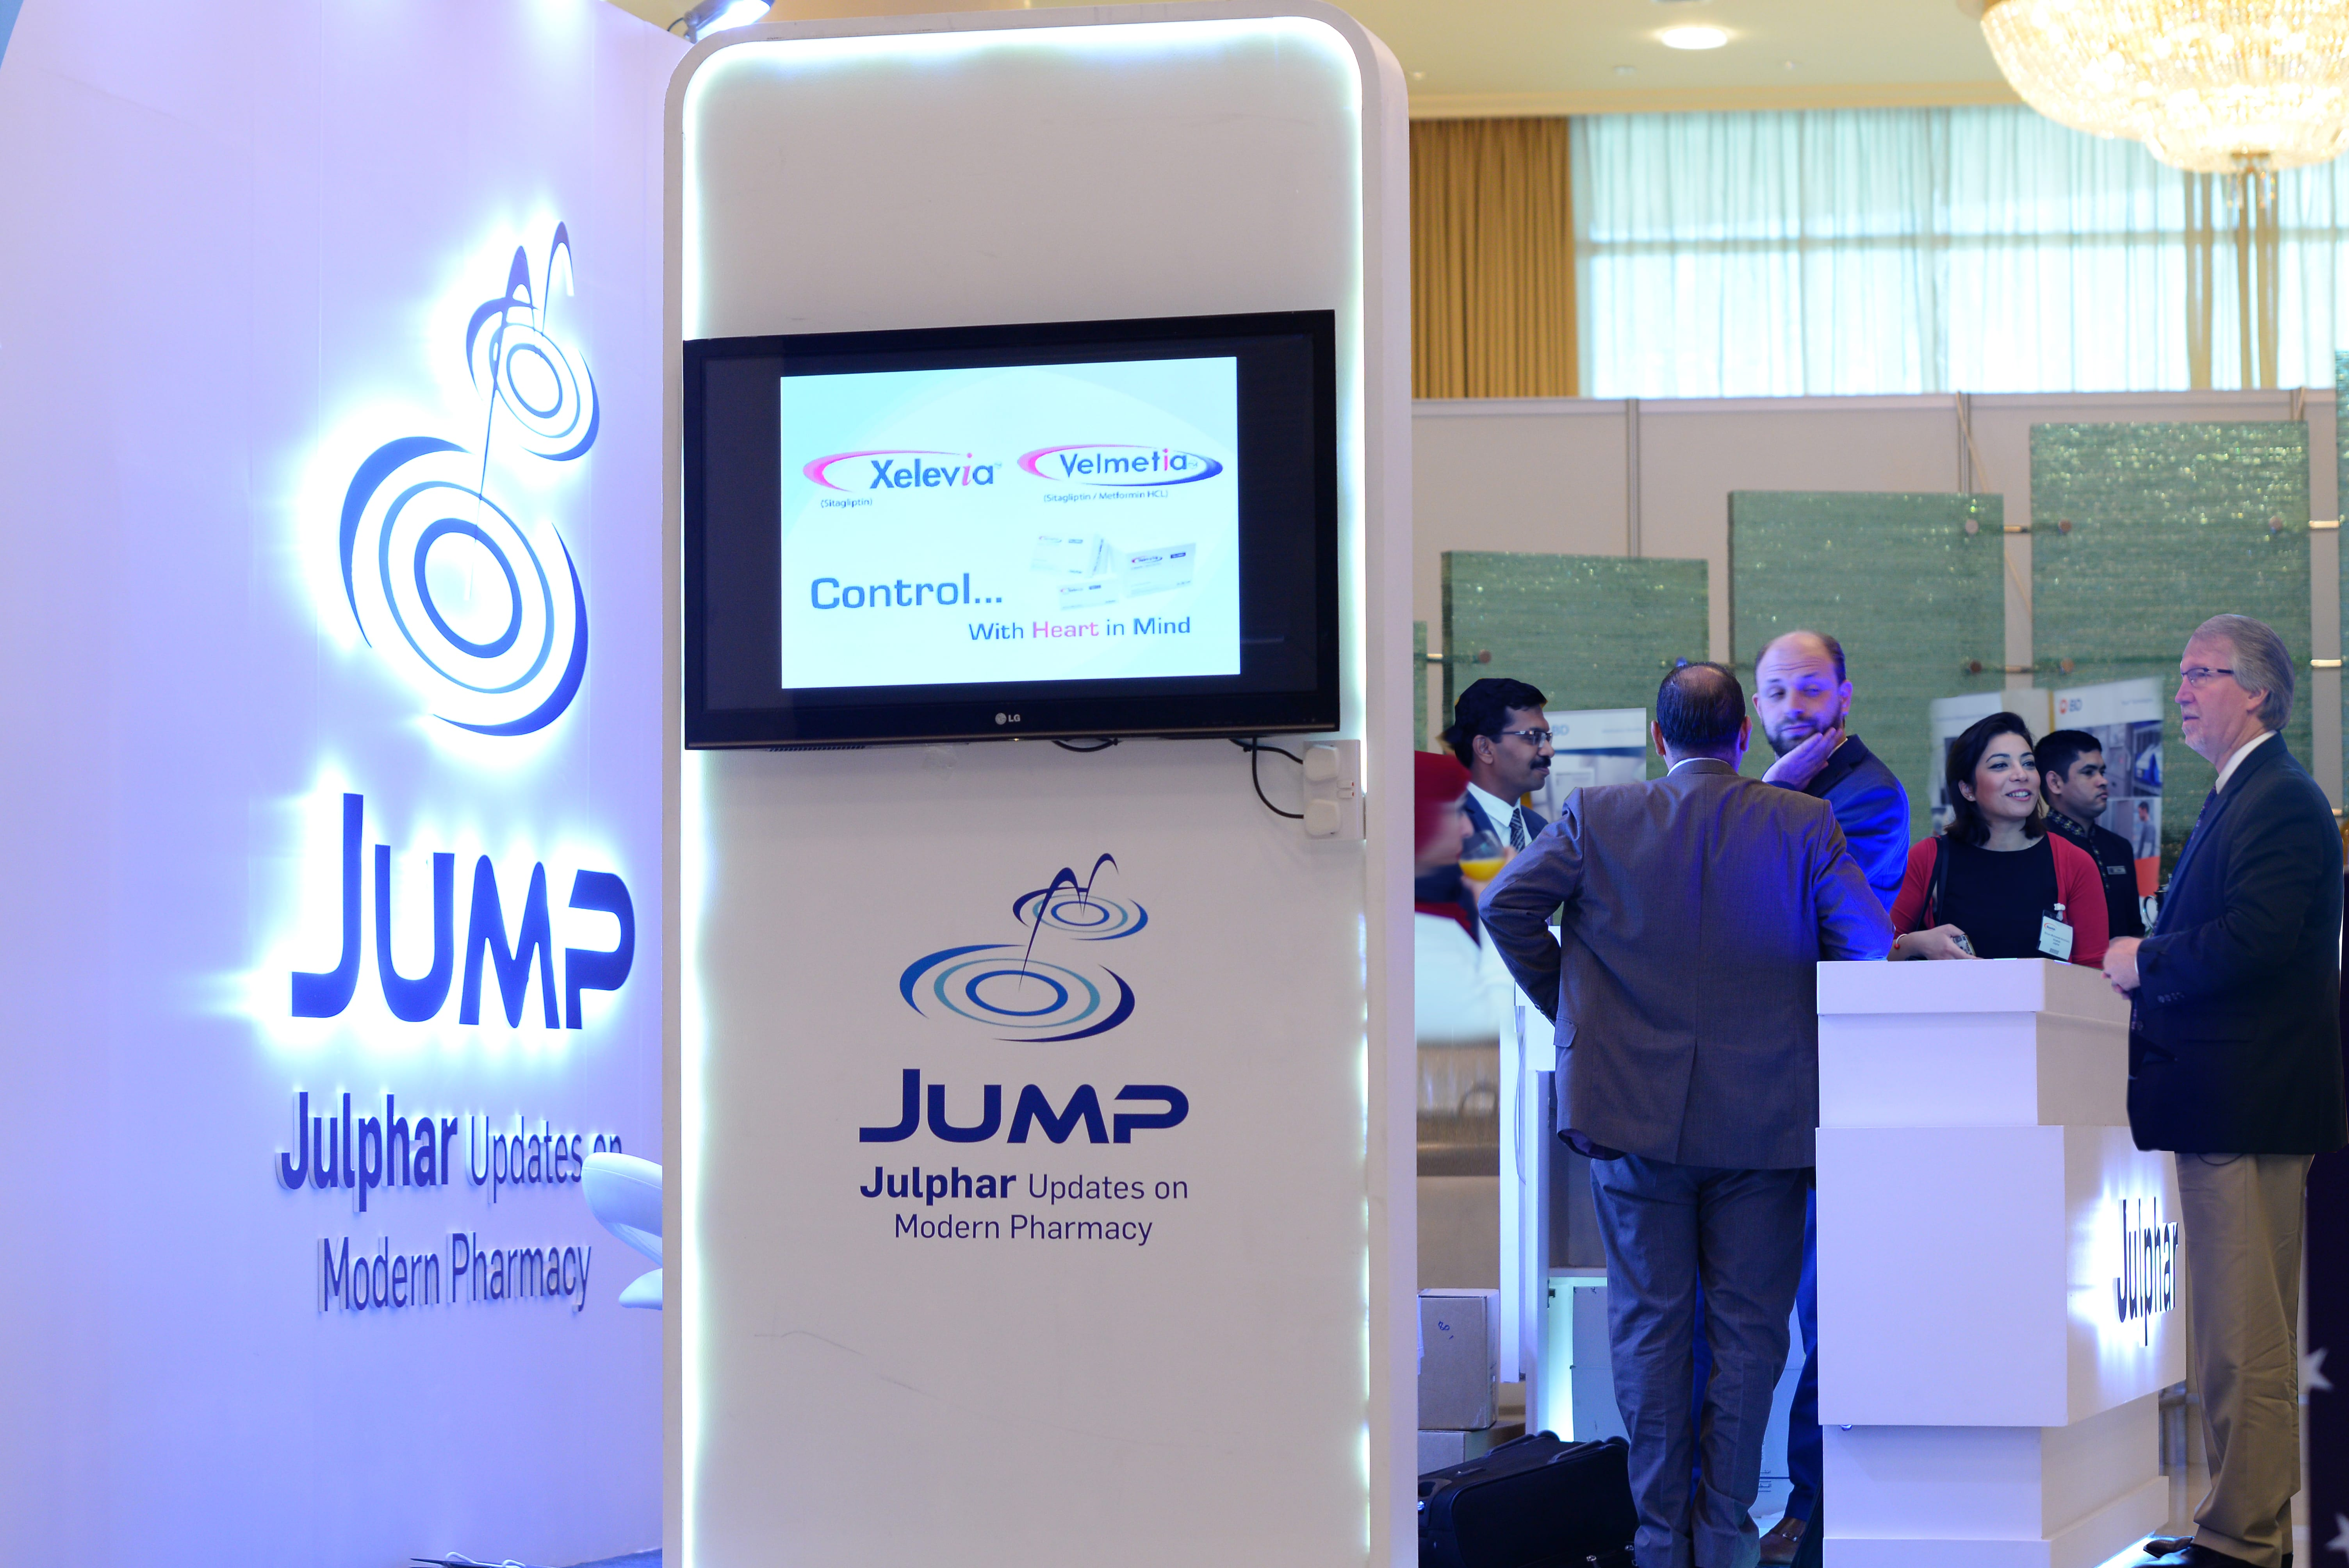 Julphar's CME program JUMP participates in the 3rd GCC Pharmacy Congress